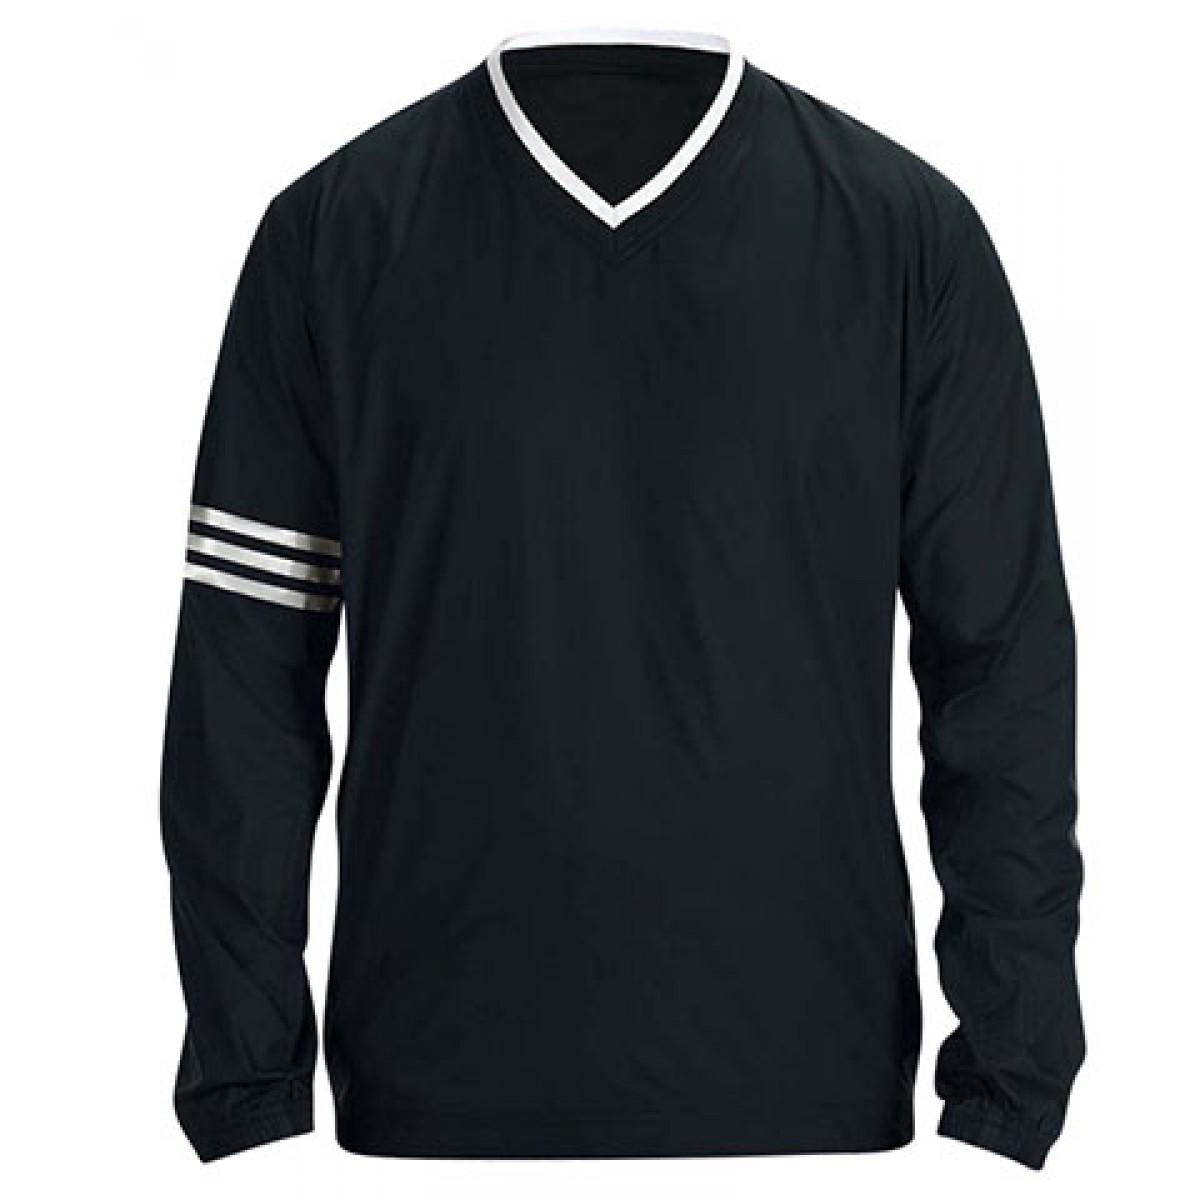 Adidas ClimaLite V-Neck Long Sleeve Wind Shirt-Black-2XL